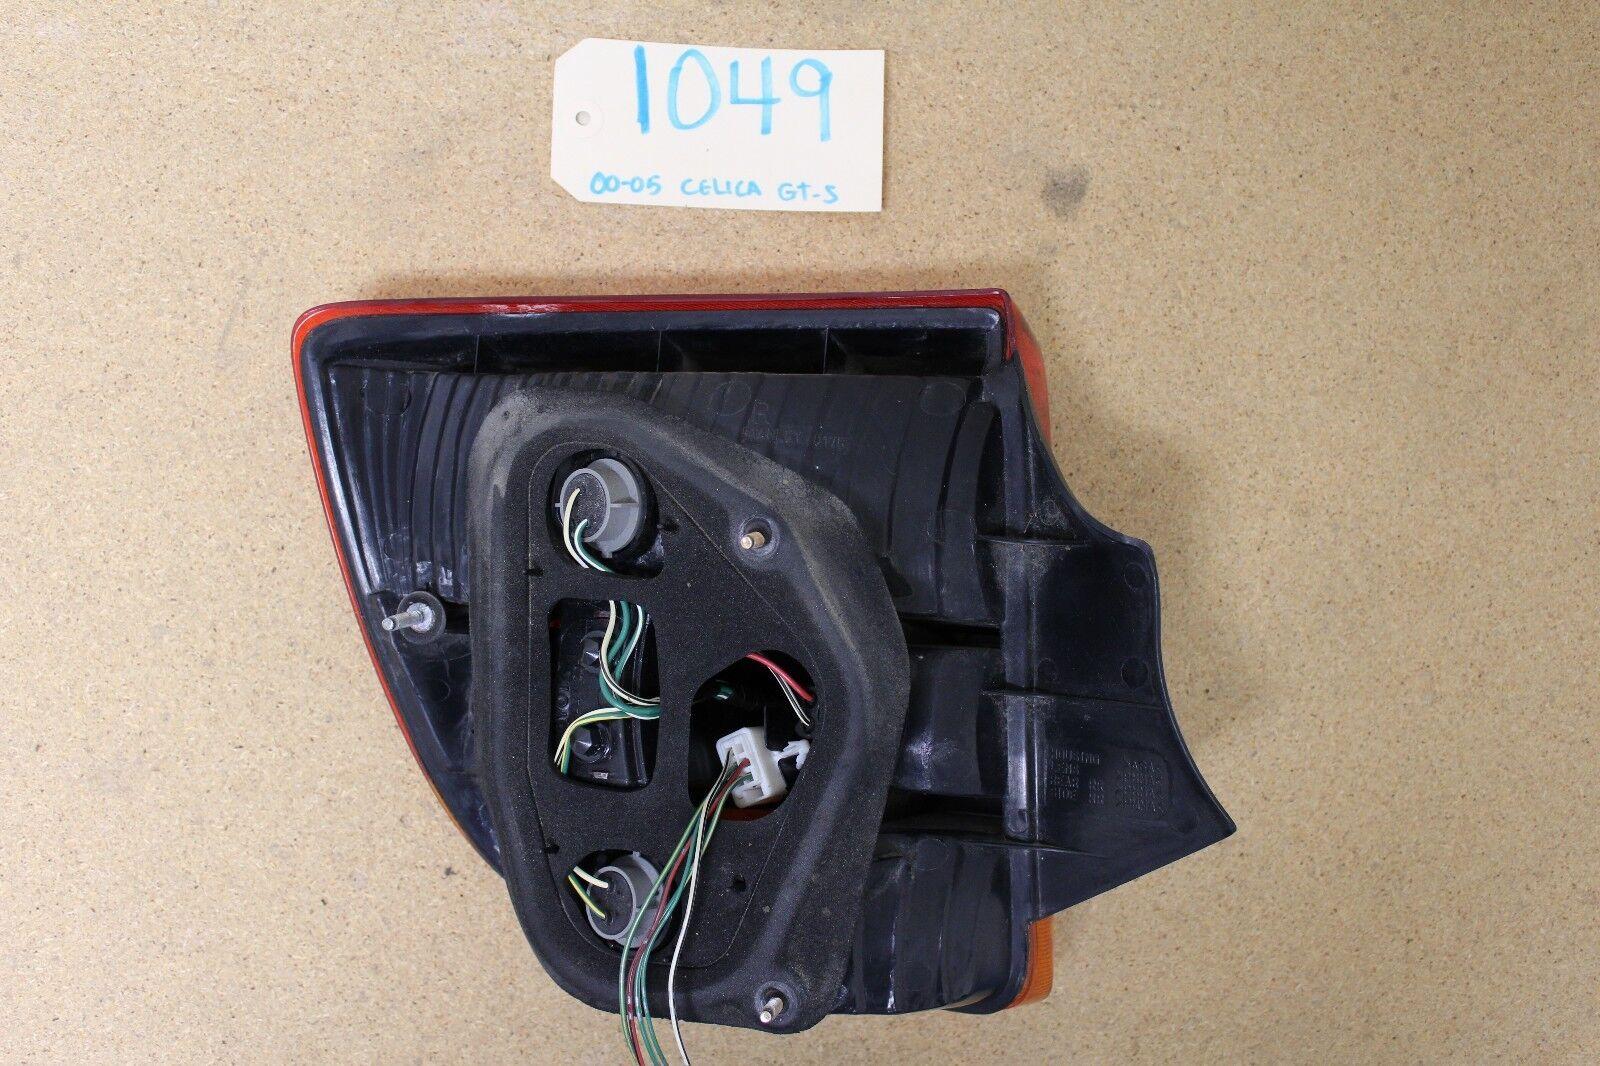 Used Toyota Celica Tail Lights For Sale 1973 Jdm 2000 2005 Gt Gts Zzt231 Oem Rear Brake Lamp